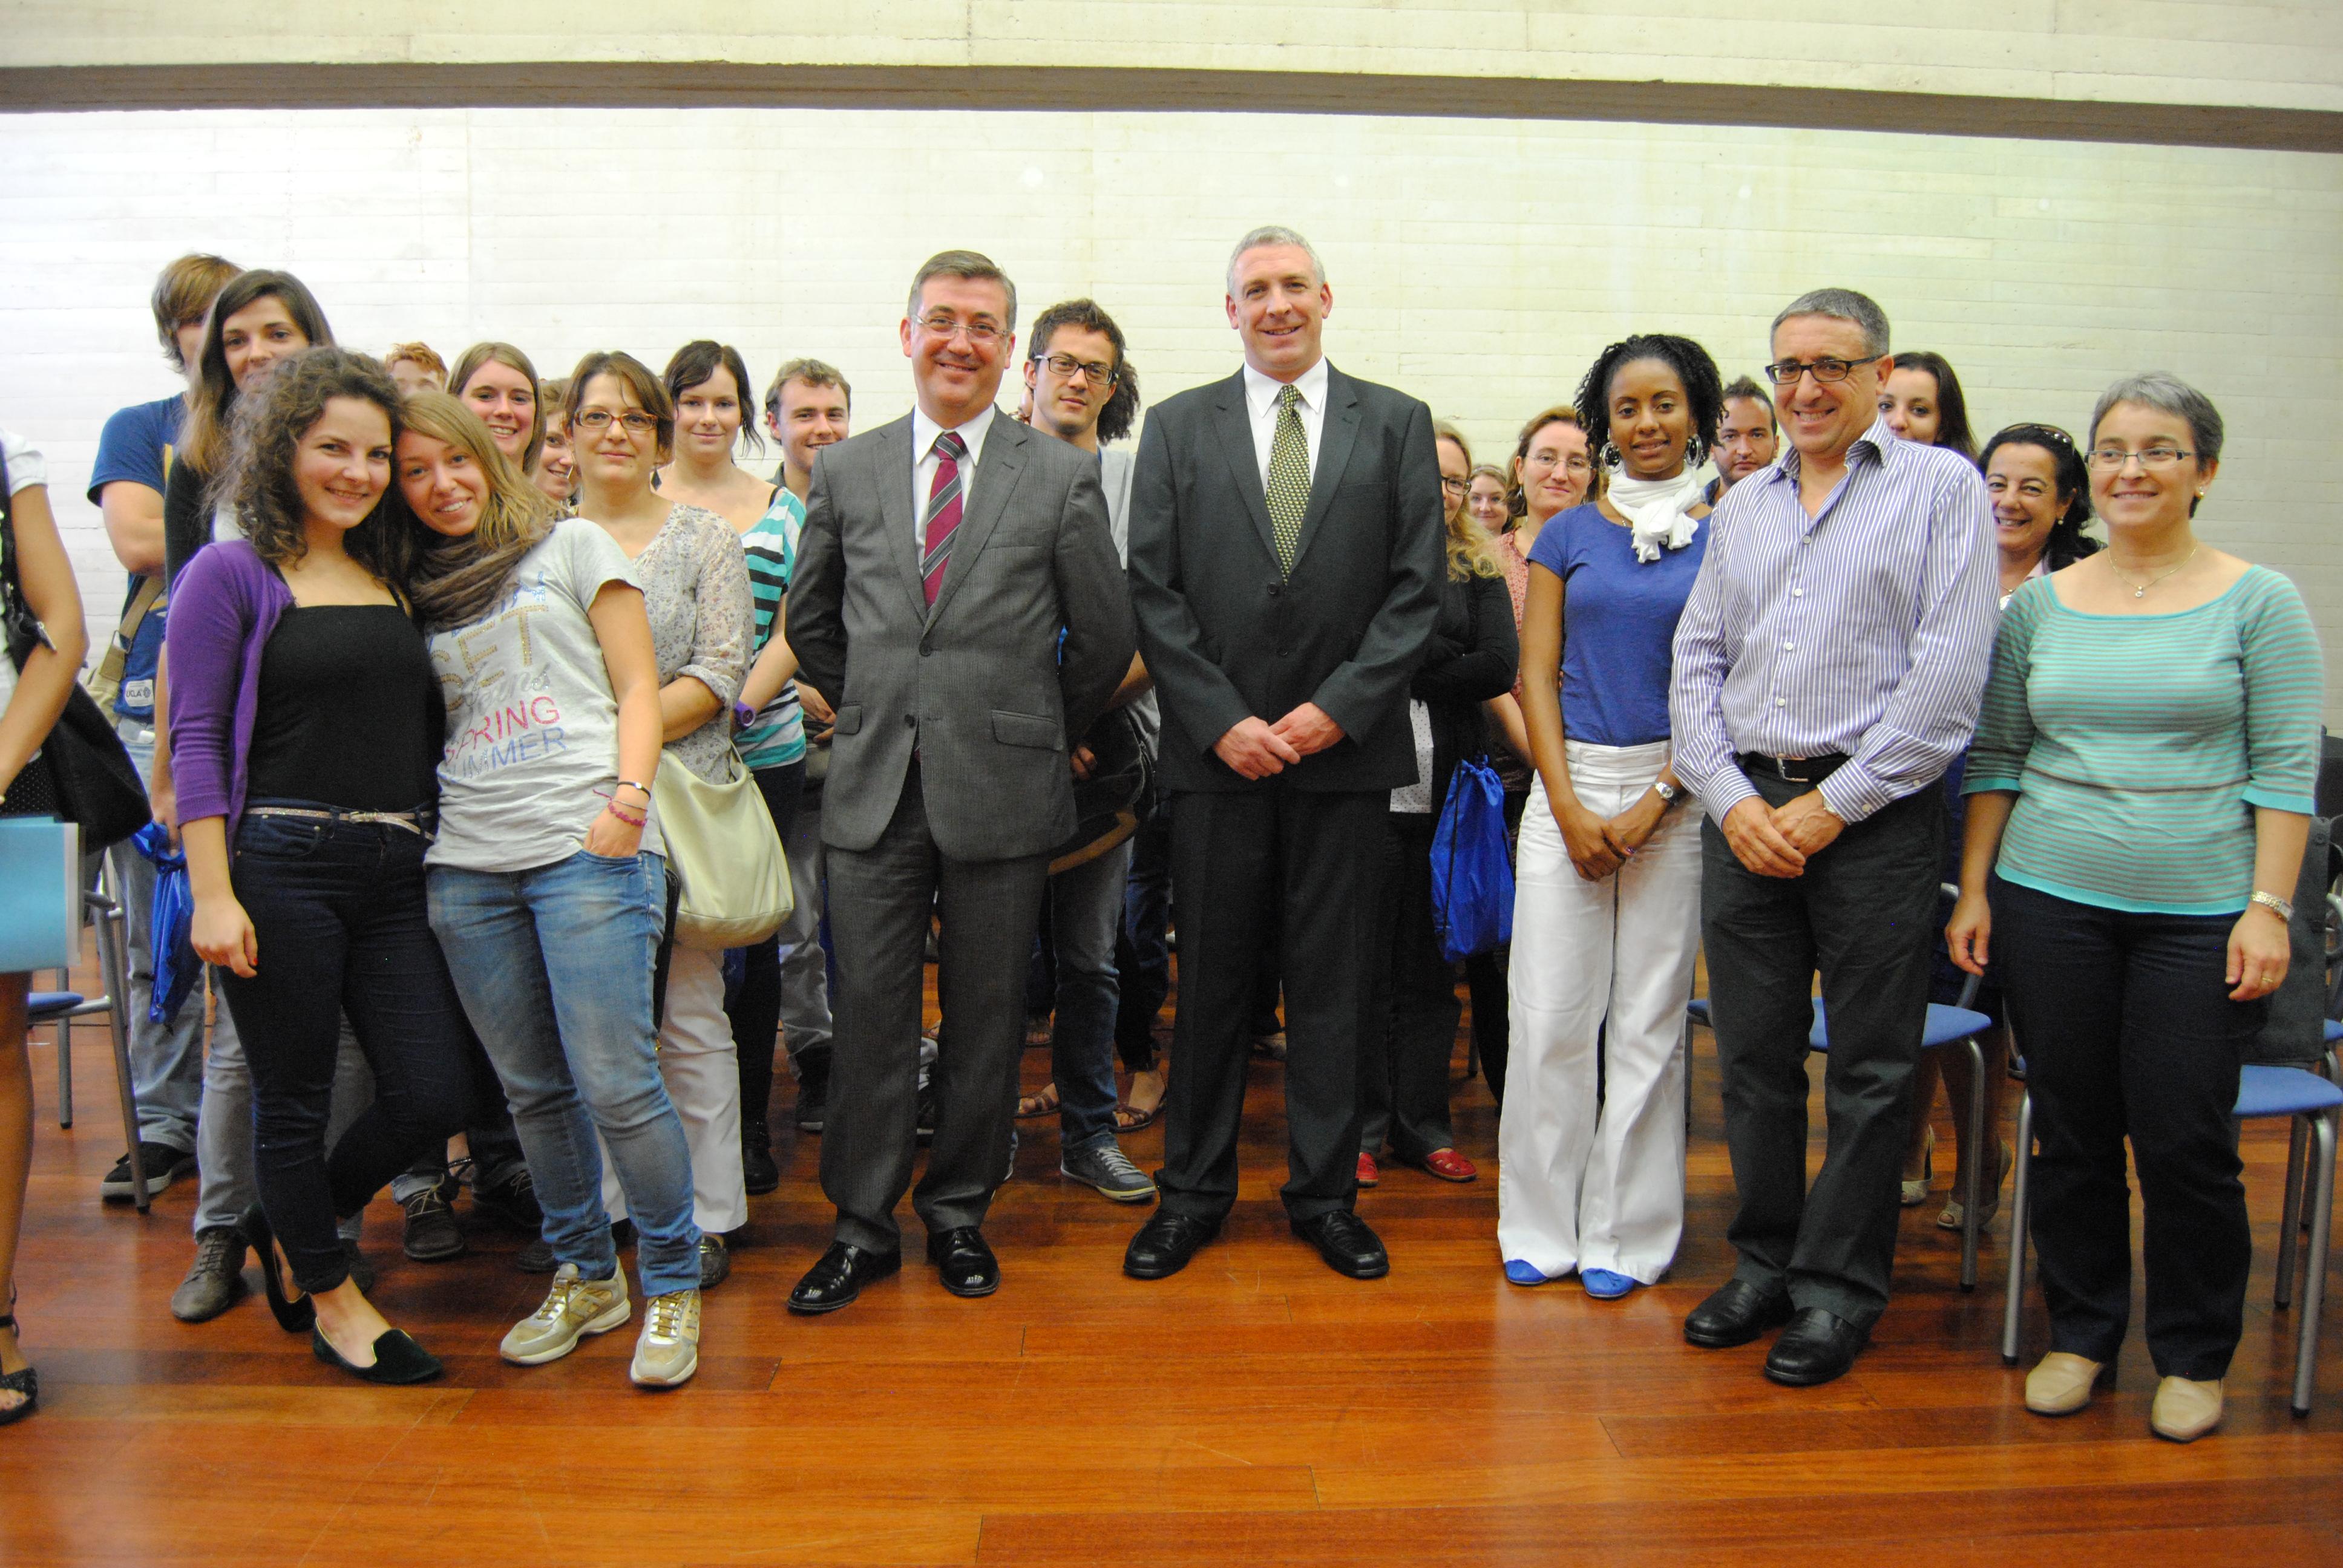 Medio centenar de profesores extranjeros van a reforzar en for Profesores en el extranjero